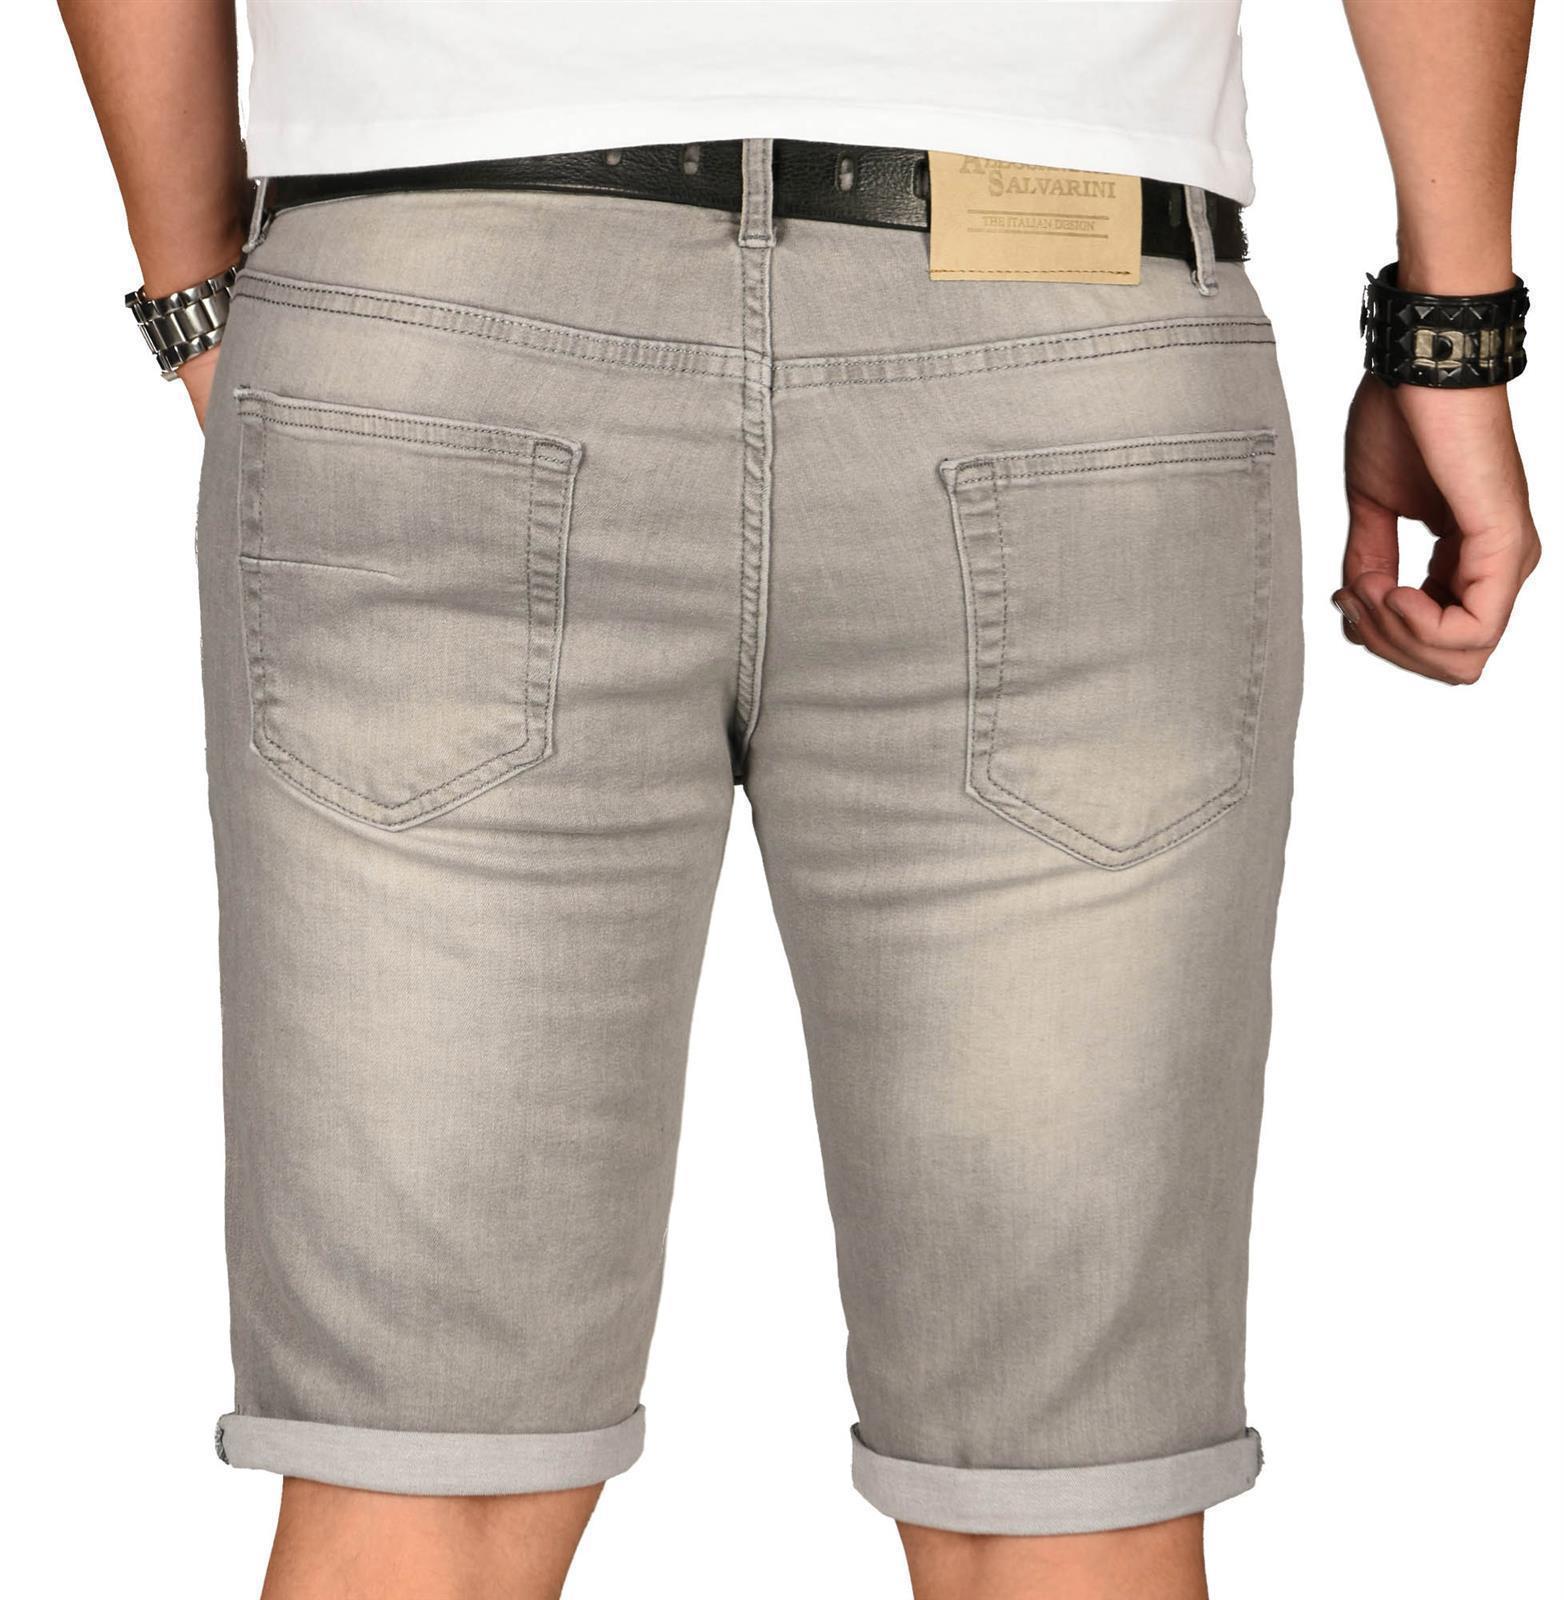 A-Salvarini-Herren-Designer-Jeans-Short-kurze-Hose-Slim-Sommer-Shorts-Washed Indexbild 41